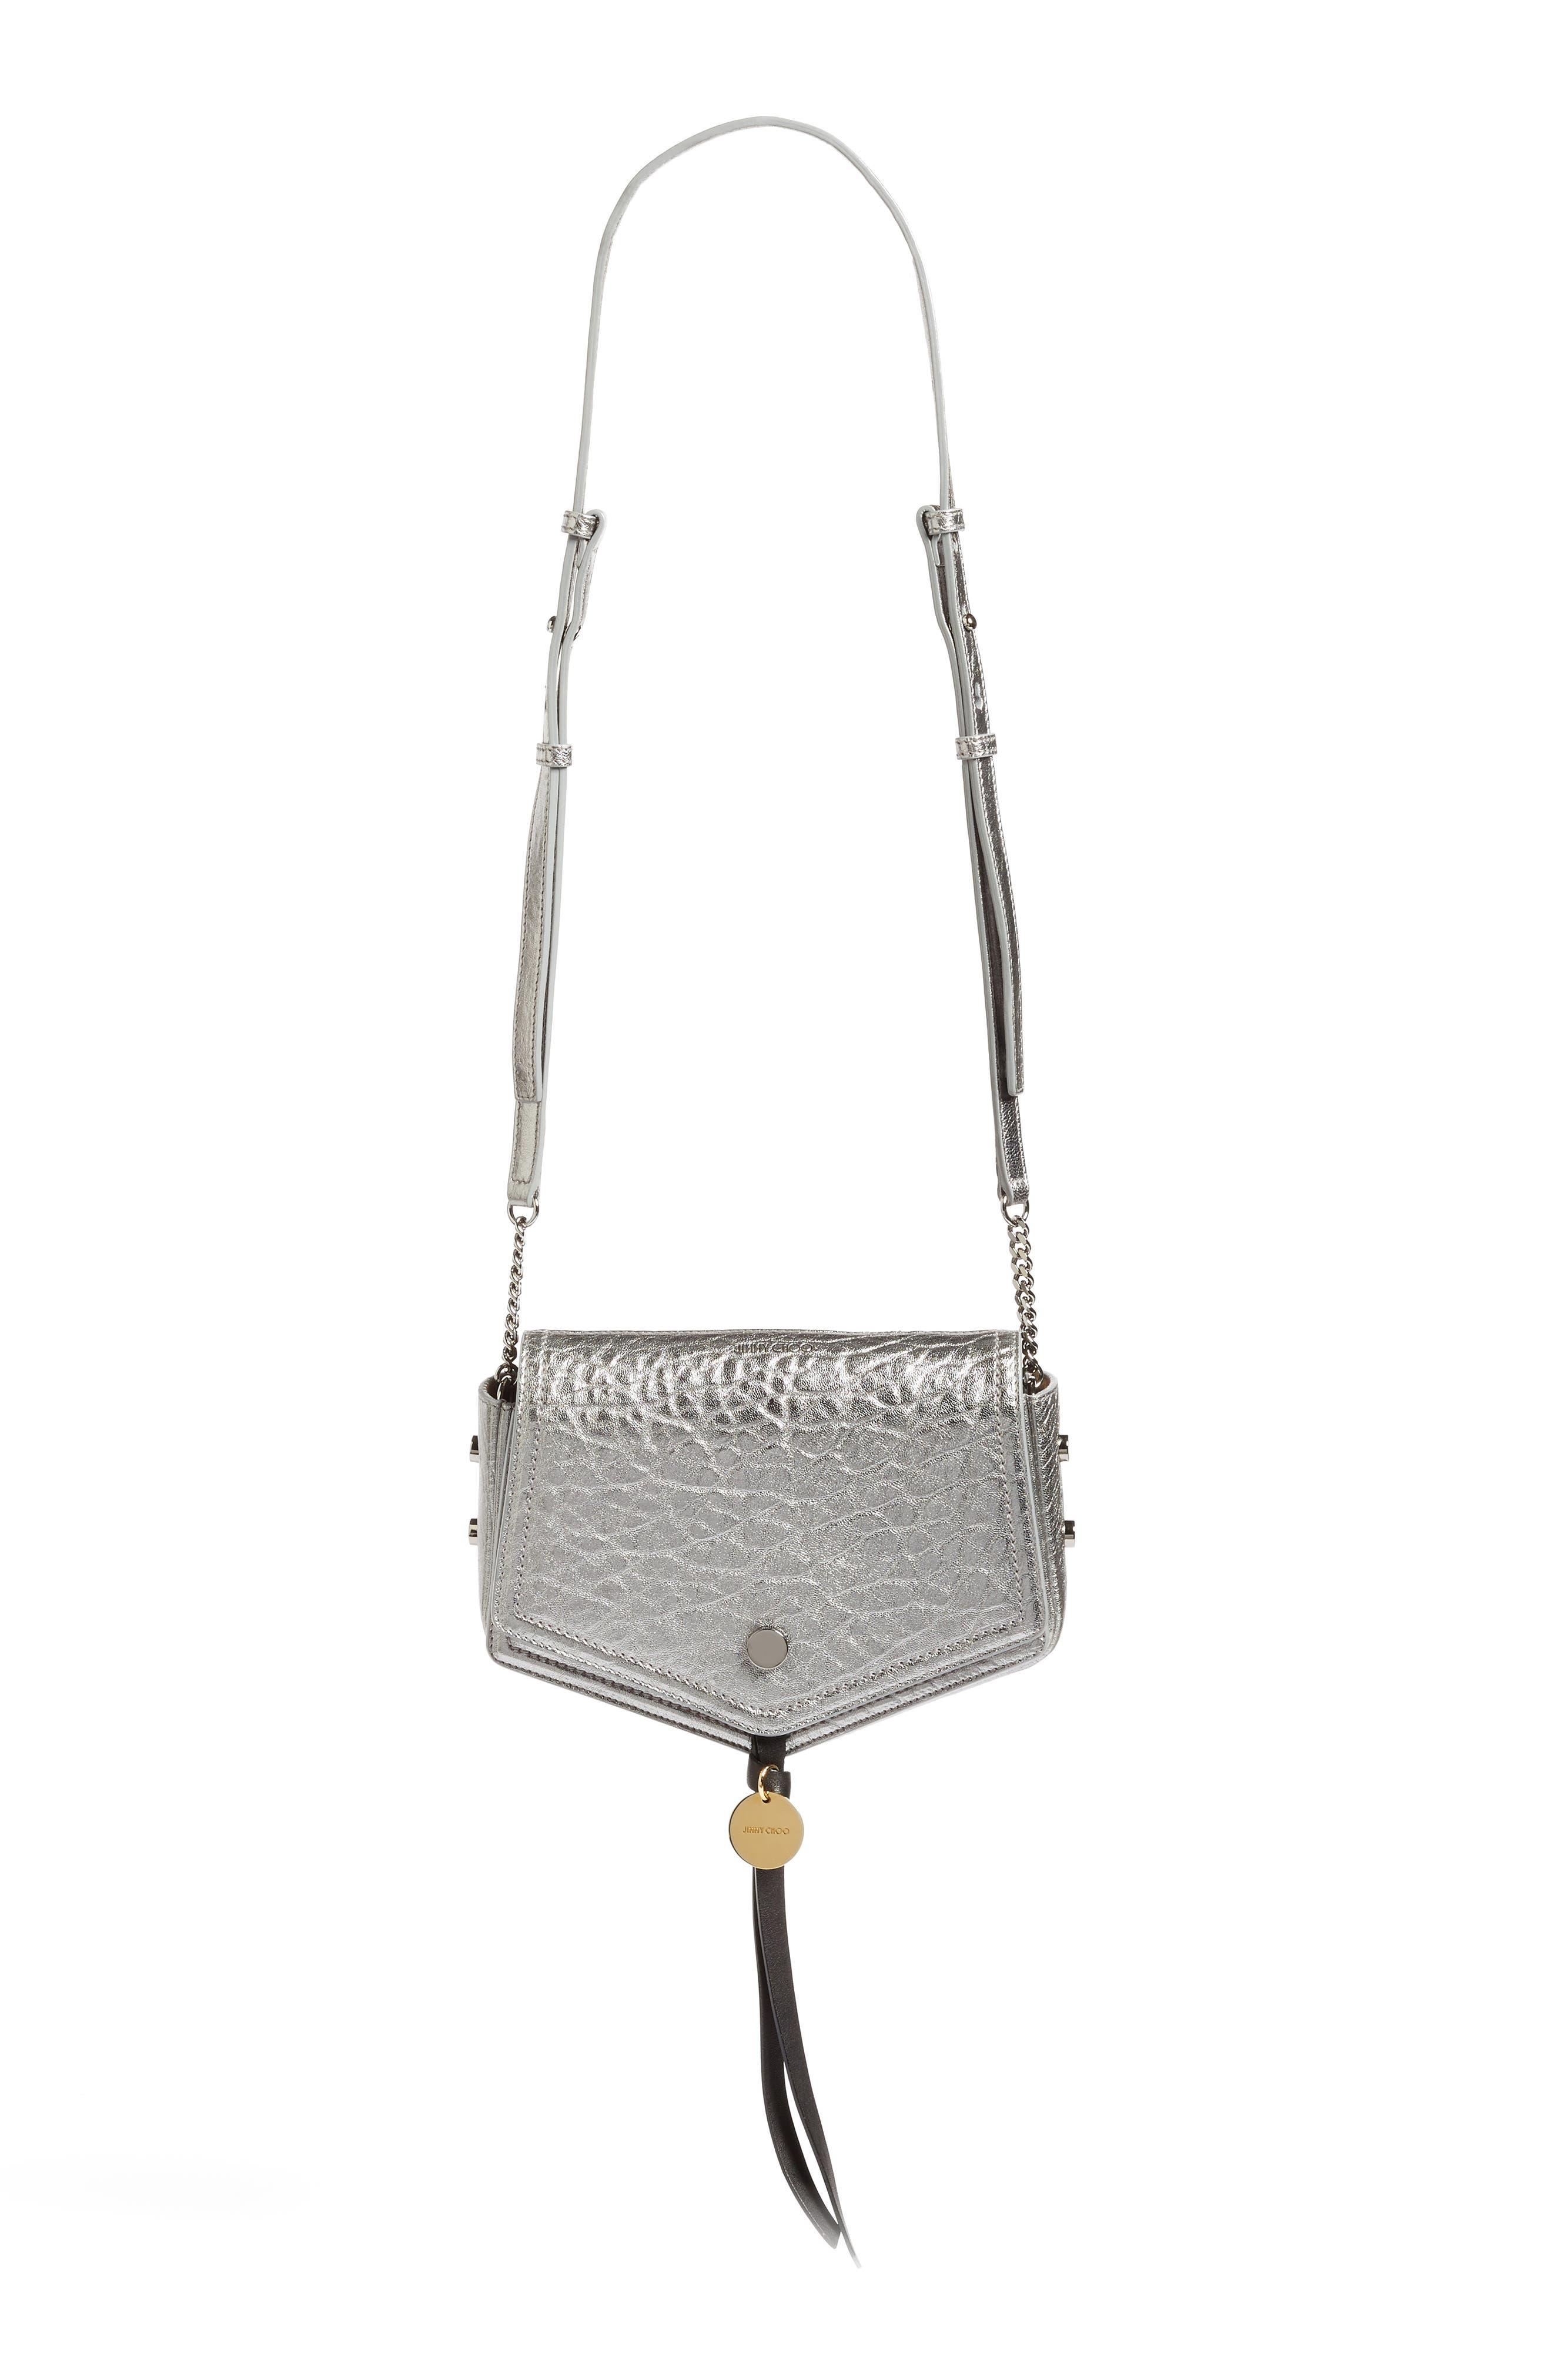 Arrow Metallic Grained Leather Shoulder Bag,                             Main thumbnail 1, color,                             045